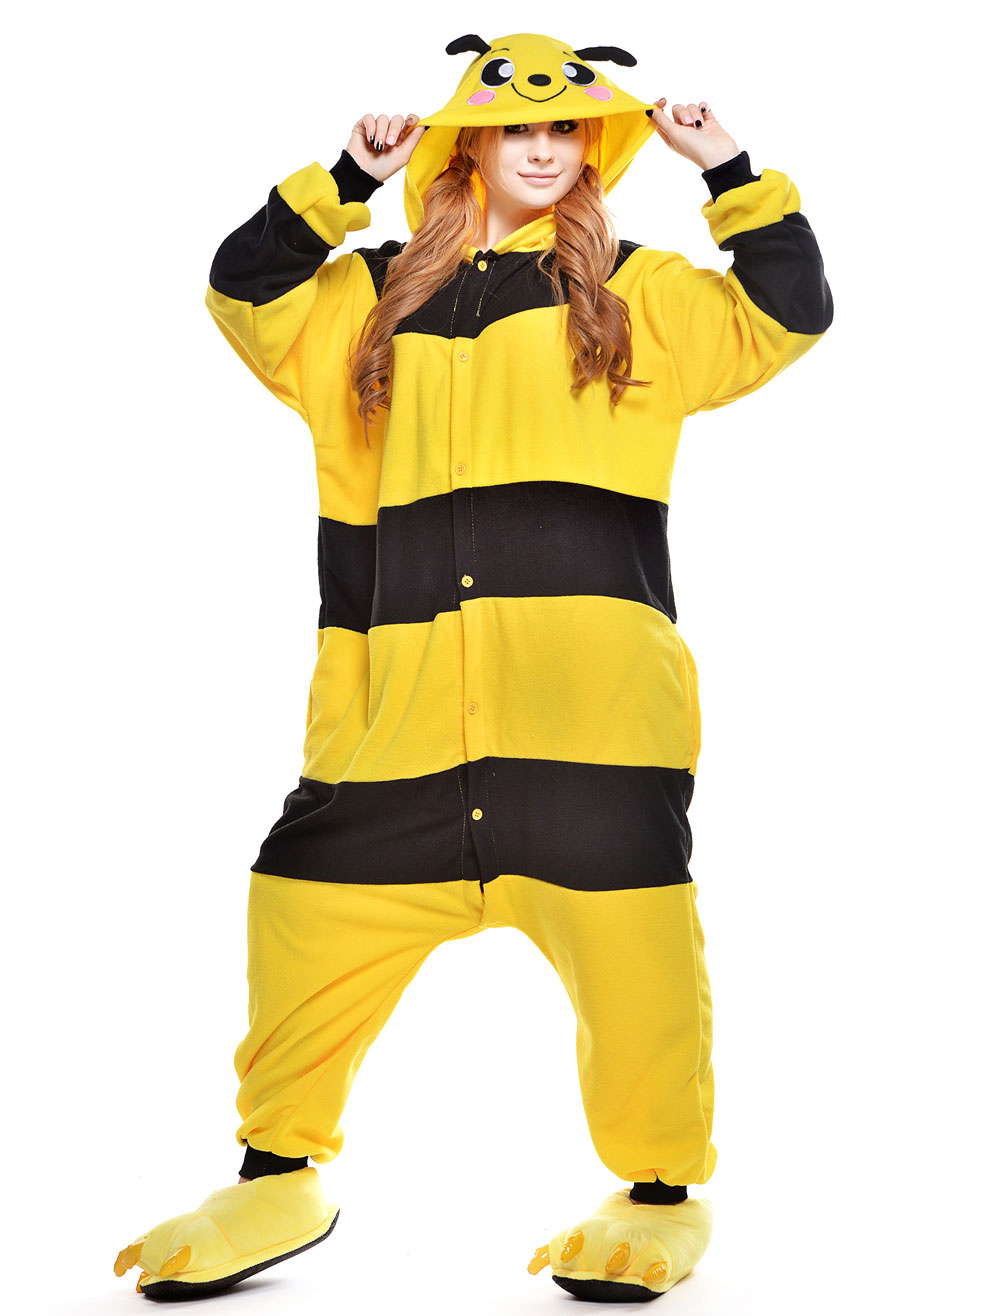 Kigurumi Pajama Bee Onesie For Adult fleece Flannel Yellow Black Stripe  Costume Halloween-No. 9ff3b0d65